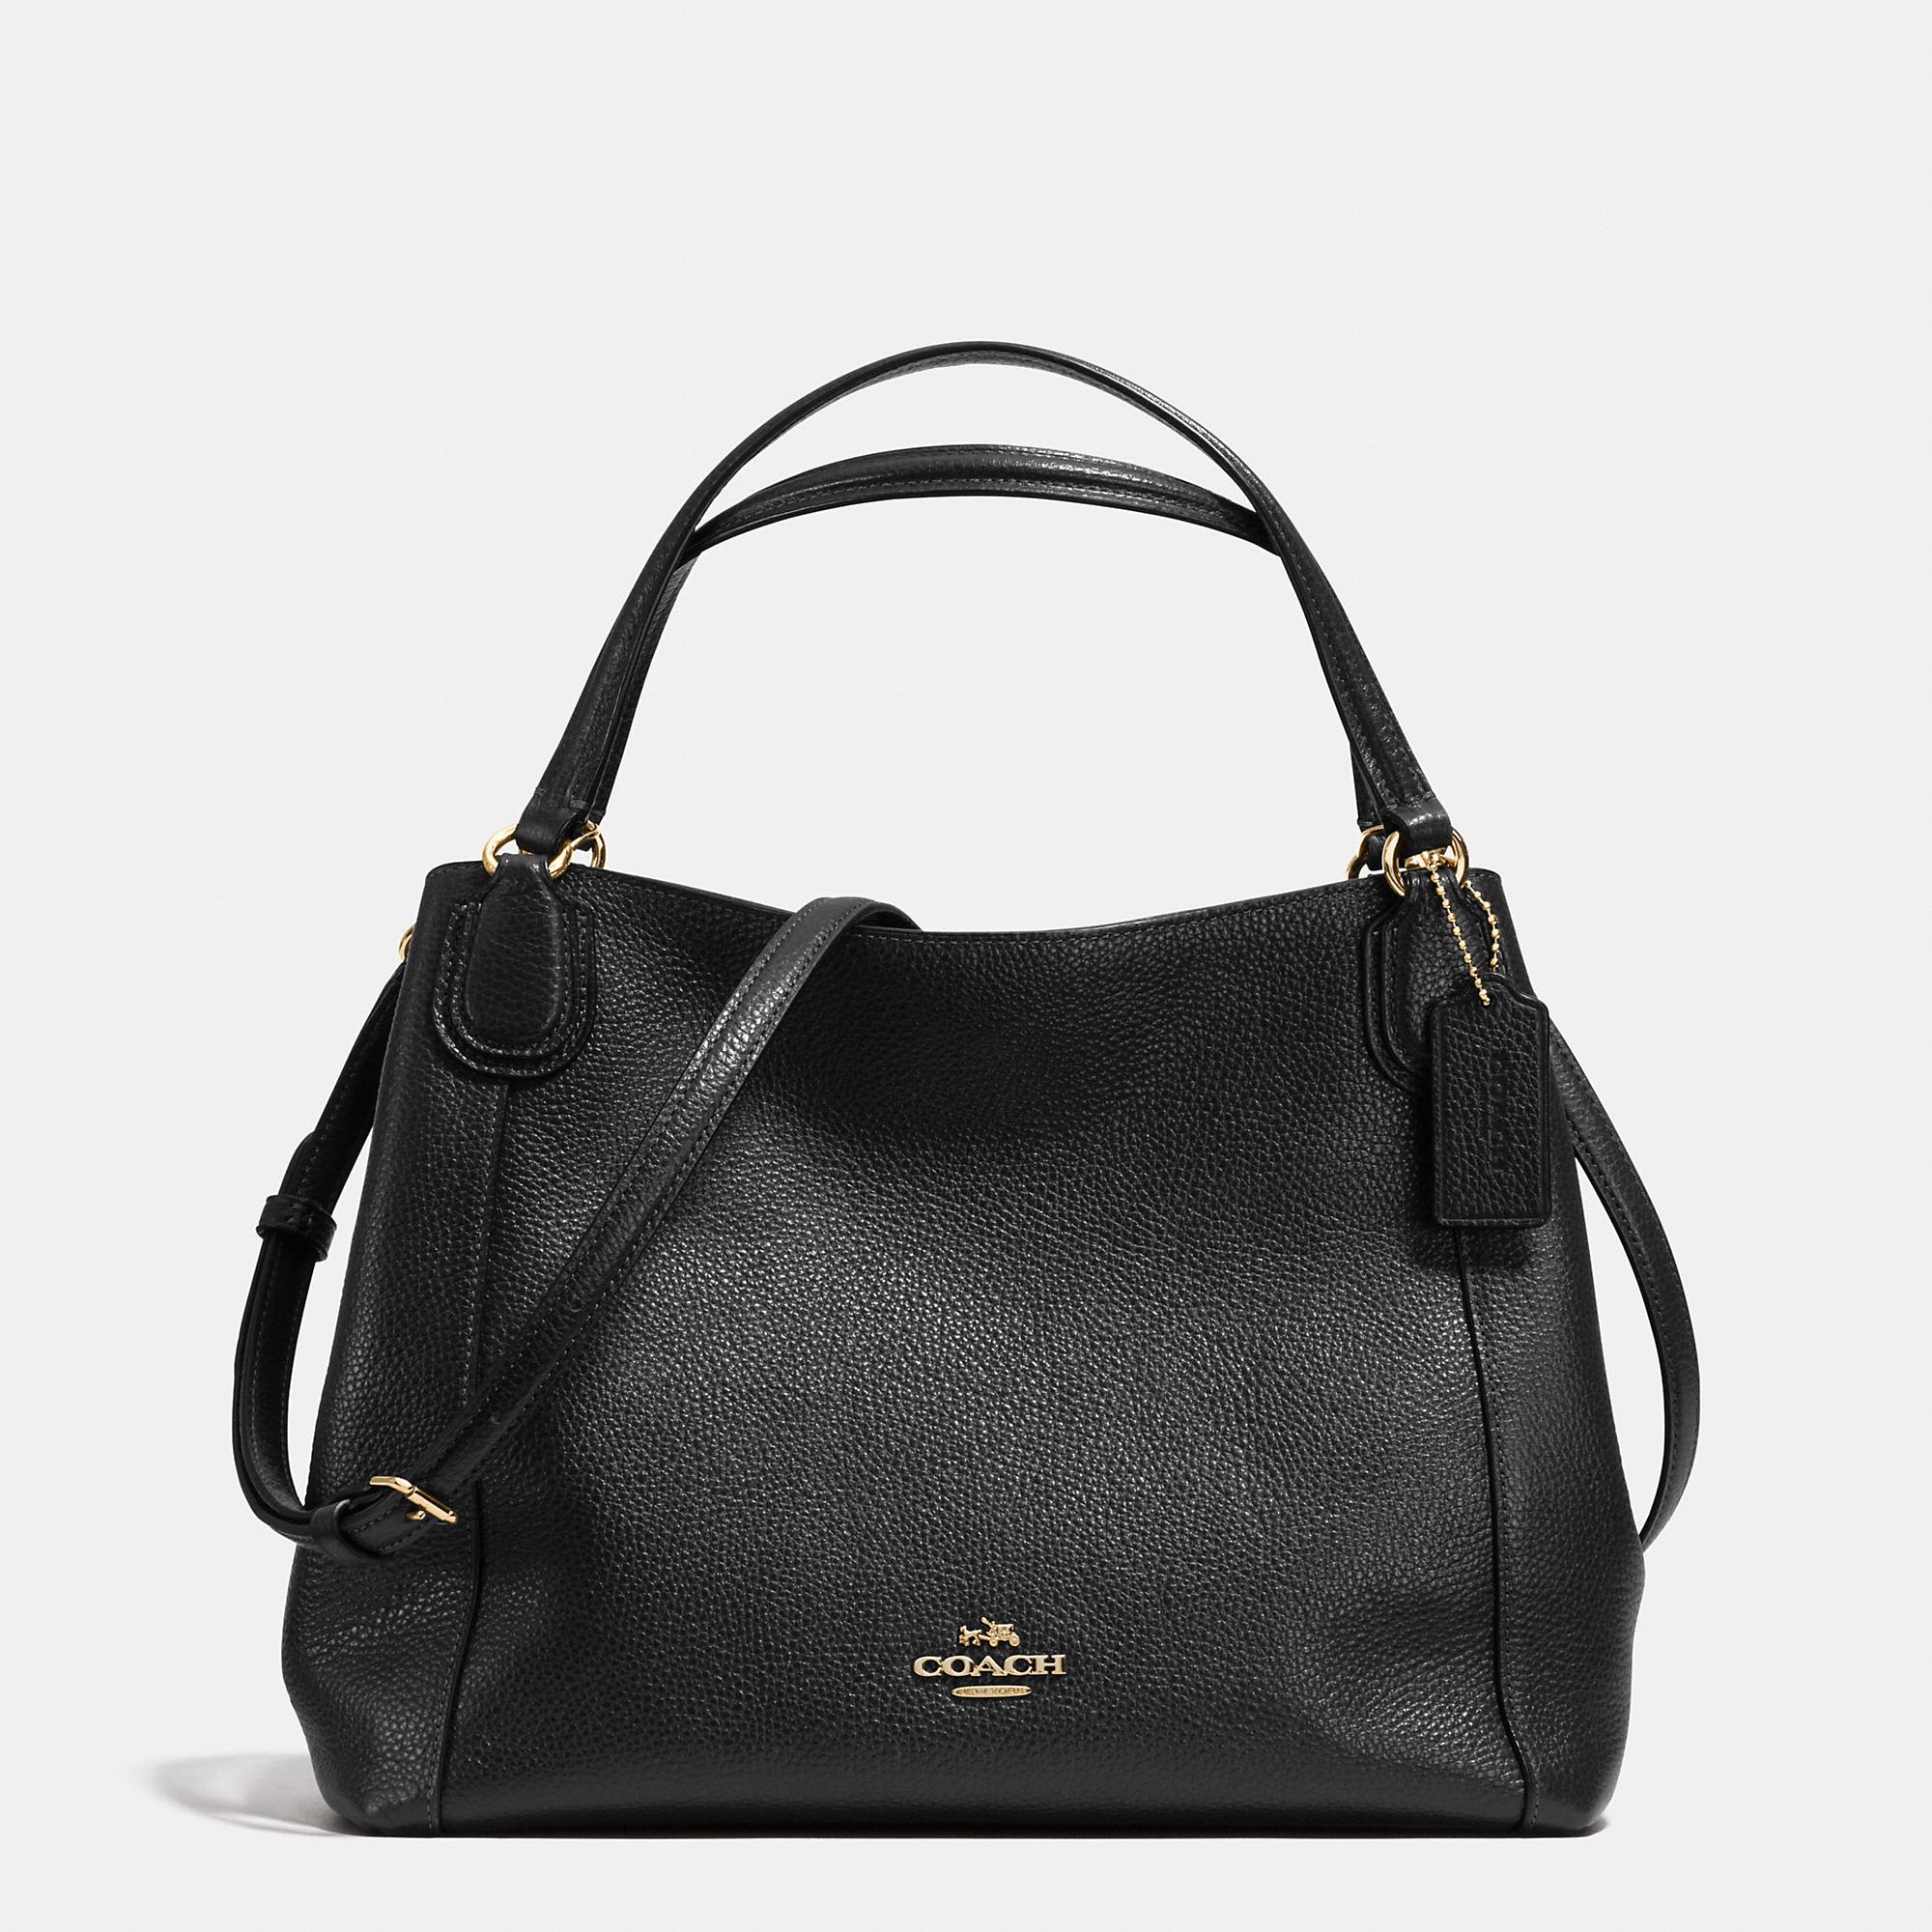 9cdfafcf COACH Black Edie Shoulder Bag 28 In Pebble Leather